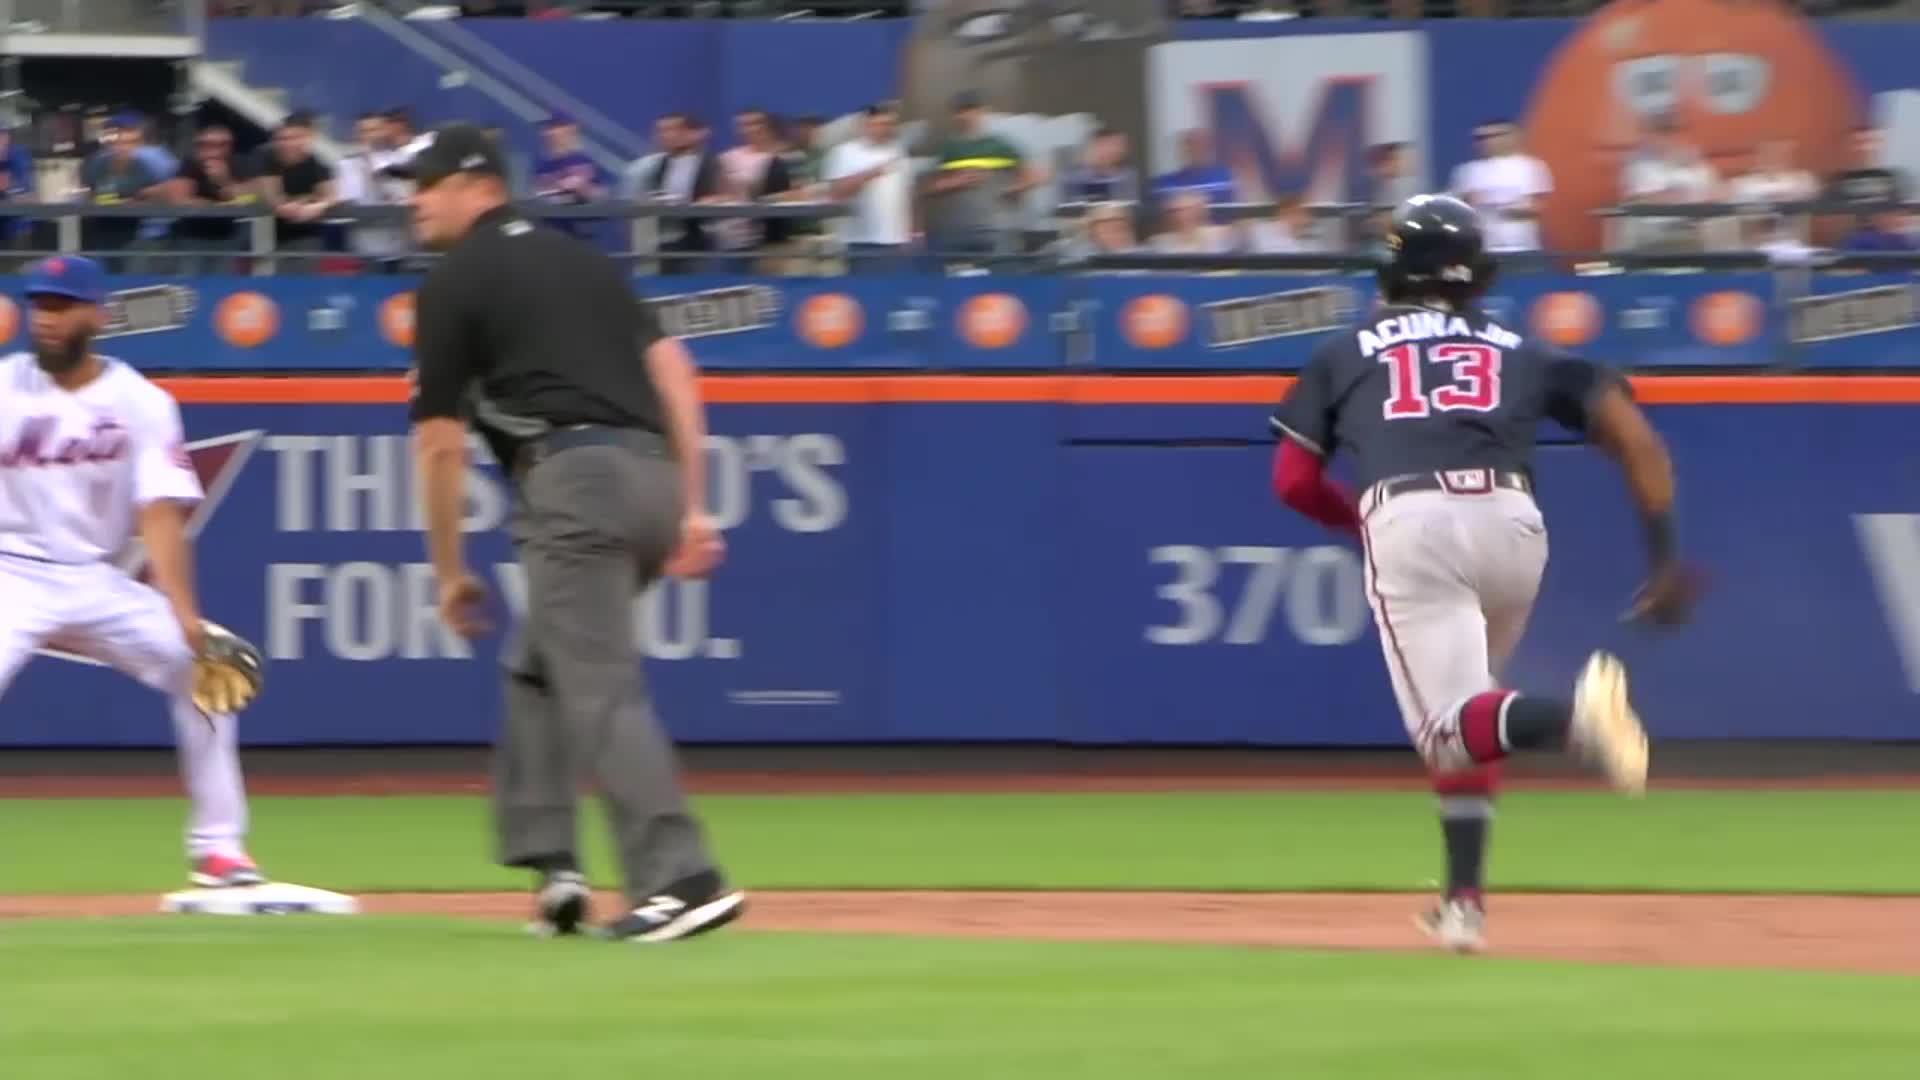 atlanta, atlanta braves, baseball, braves, Ronald Acuña Jr. slides into second, gets dirt on his face. GIFs